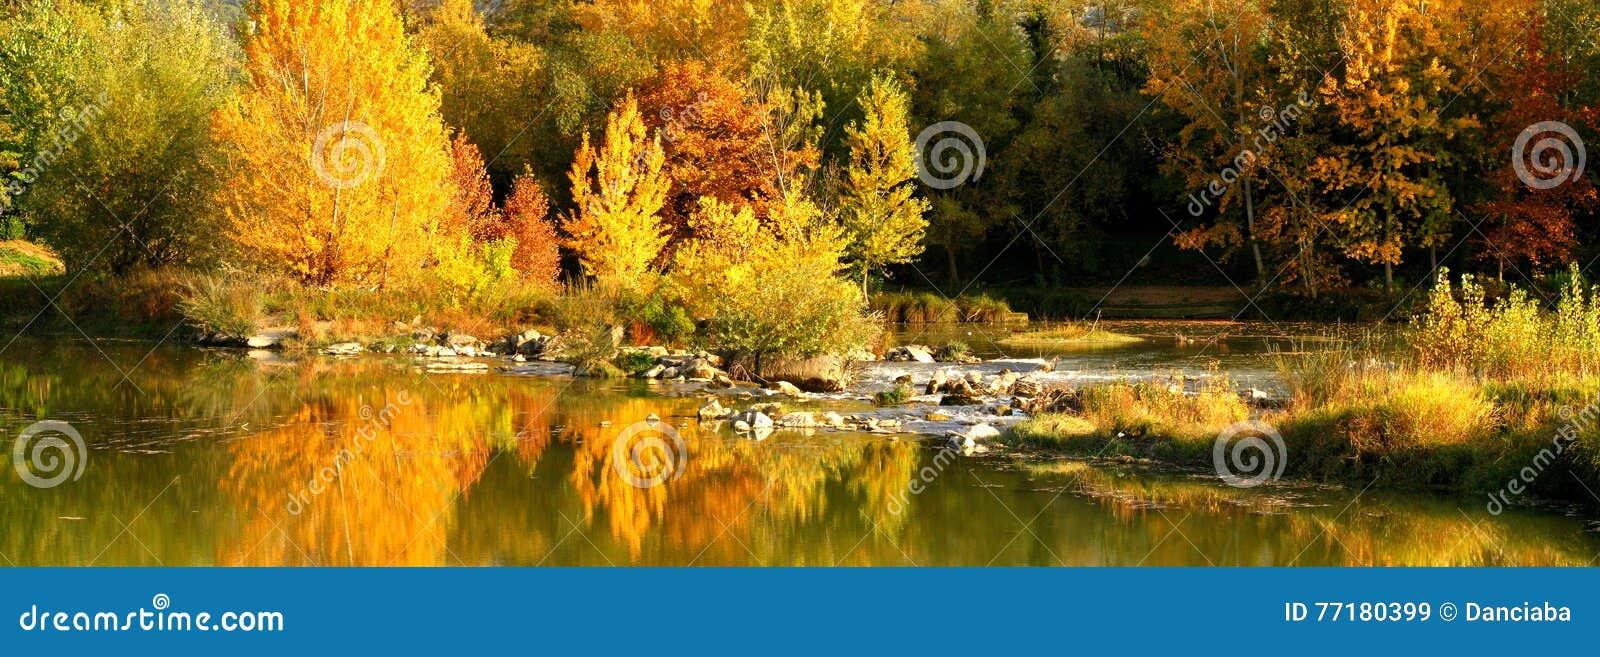 Schöner Autumn Scene nahe dem Arno in Florenz, Toskana, Italien